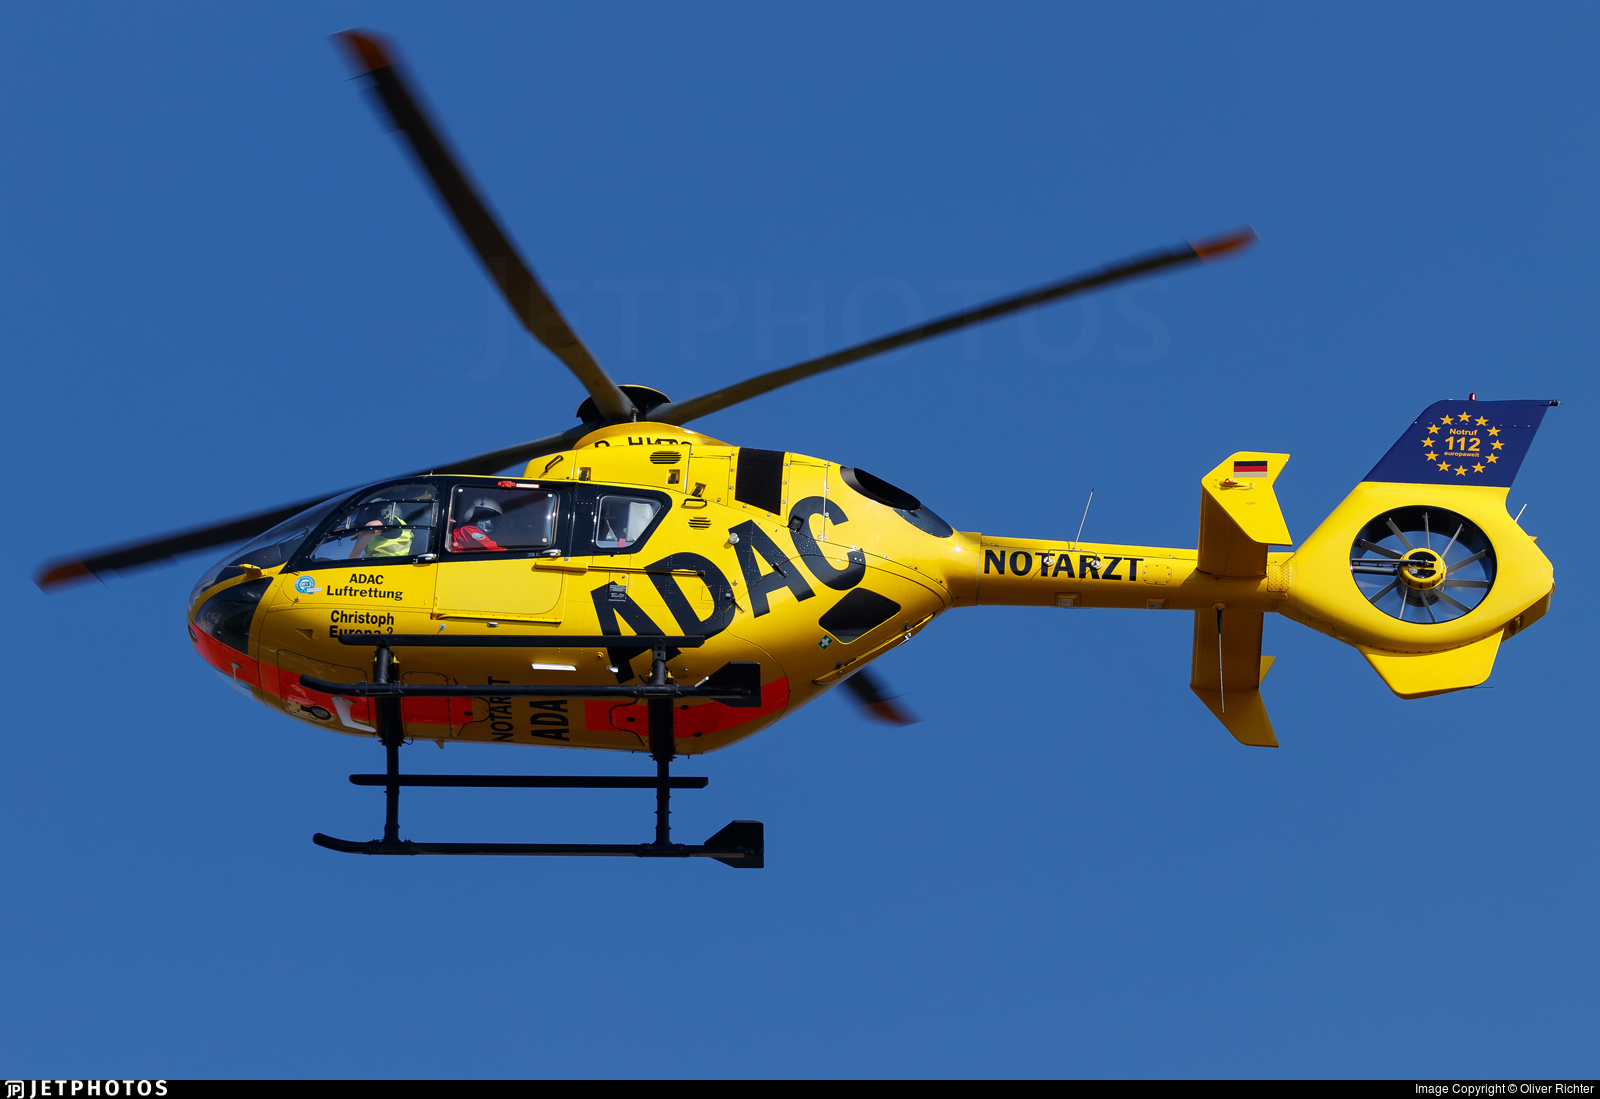 D-HHTS - Eurocopter EC 135P2 - ADAC Luftrettung